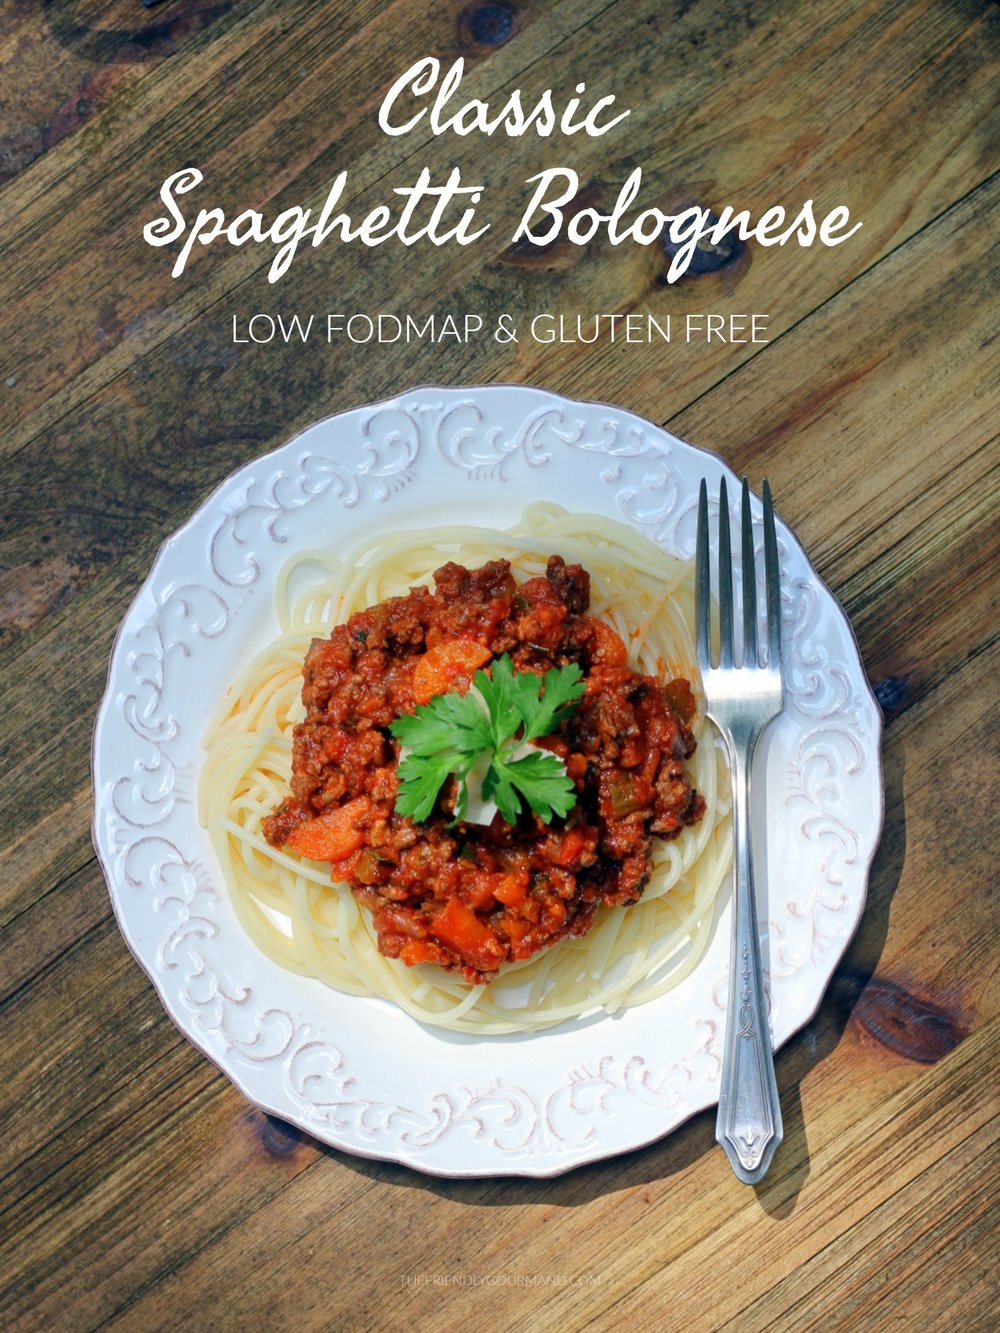 Classic Spaghetti Bolognese - Low FODMAP & Gluten Free - The Friendly Gourmand.jpg